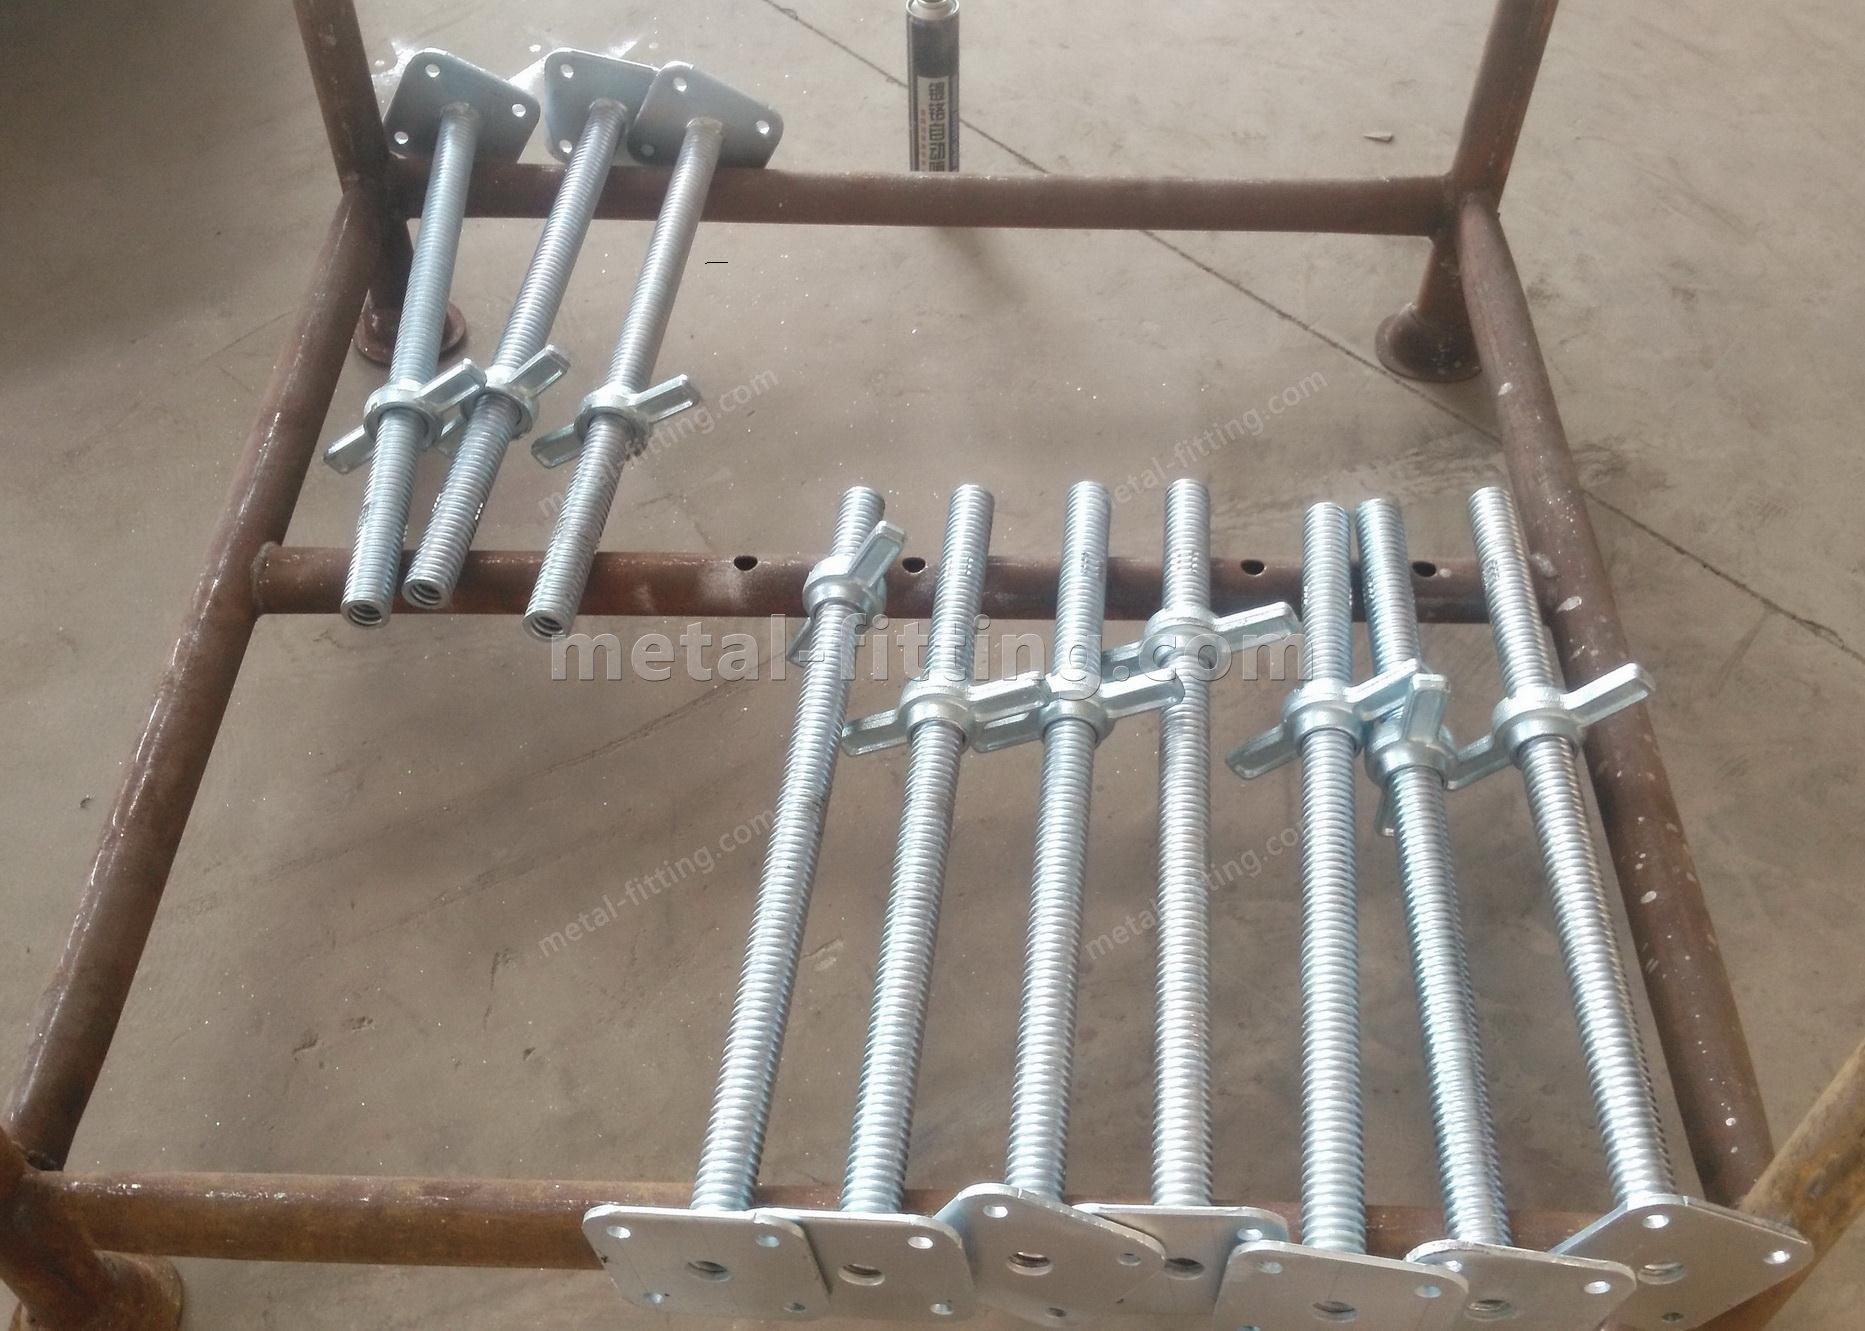 scaffolding standards jack base,scaffolding,scaffold part-jack base